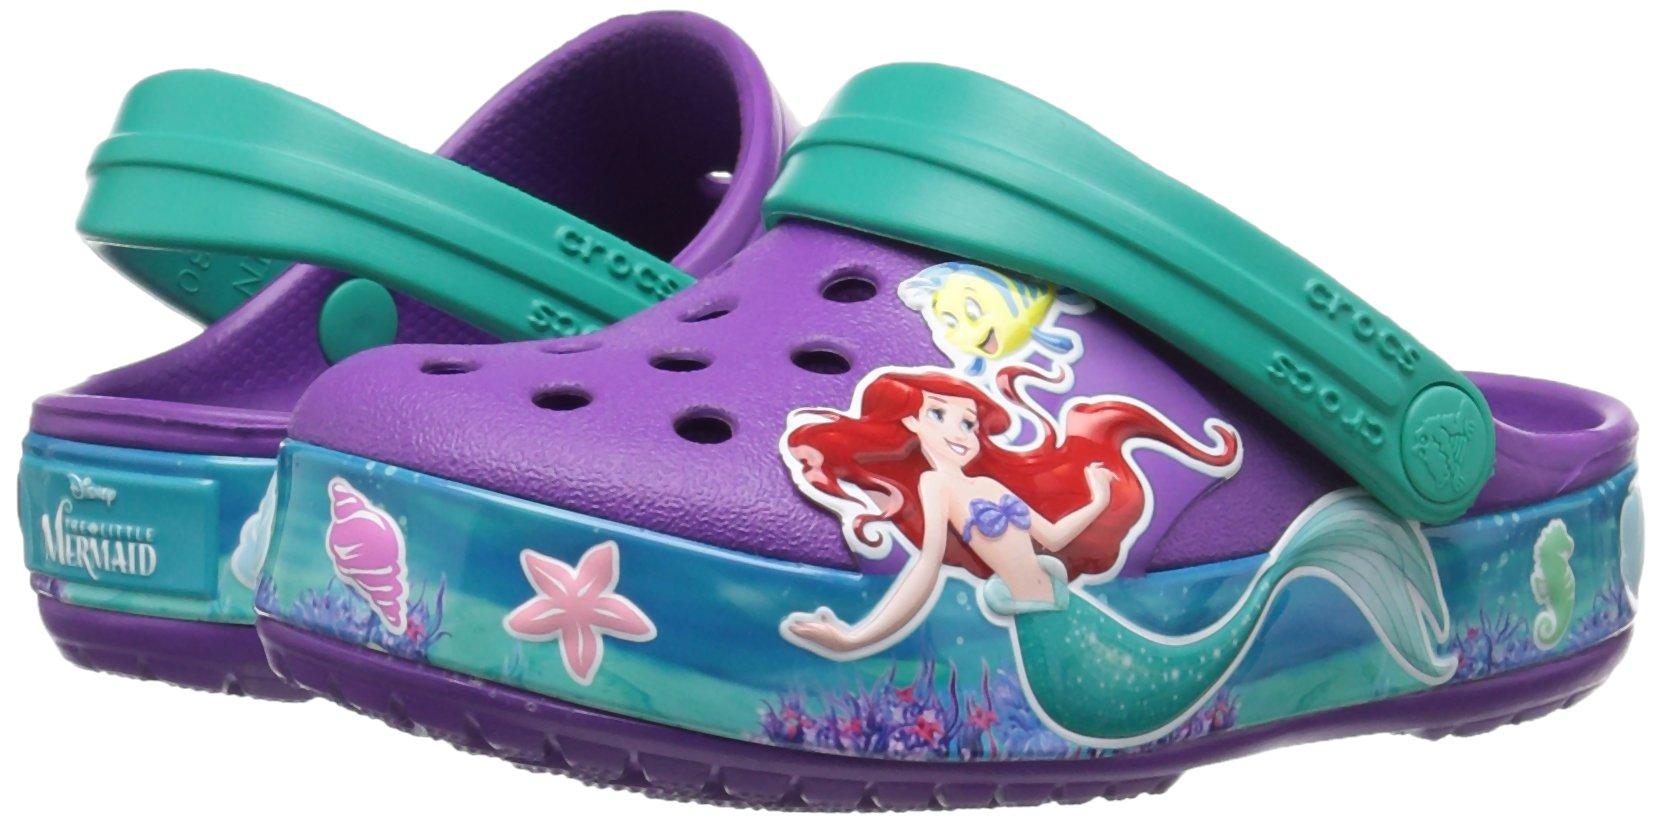 Crocs Girls' CB Princess Ariel K Clog, Amethyst, 13 M US Little Kid by Crocs (Image #6)